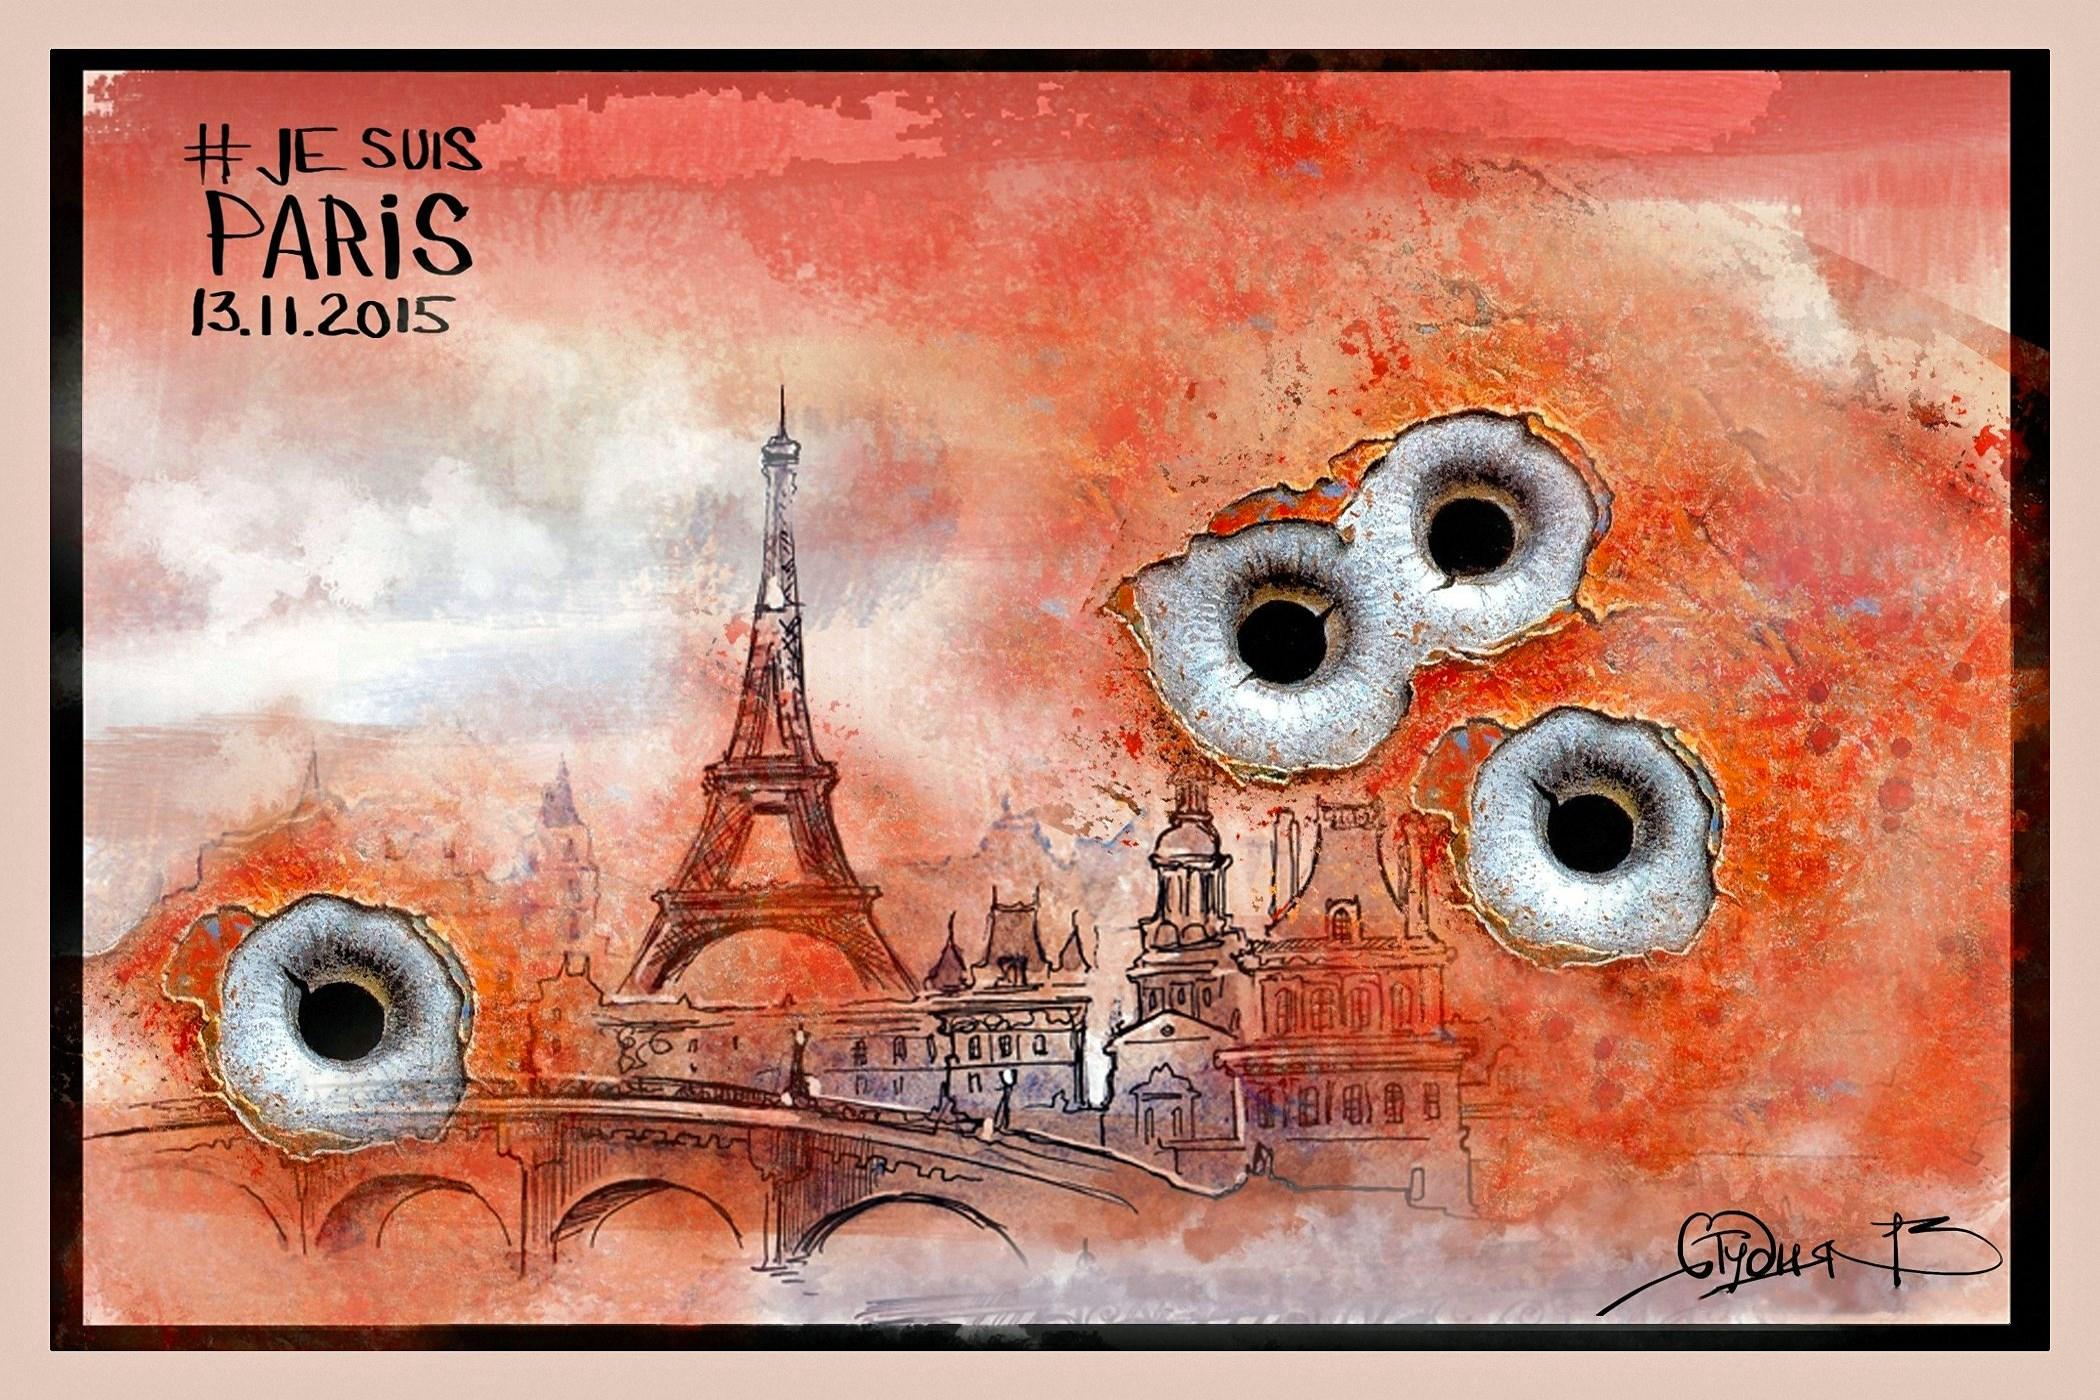 00 Vitaly Podvitsky. Je Suis Paris 2. 2015